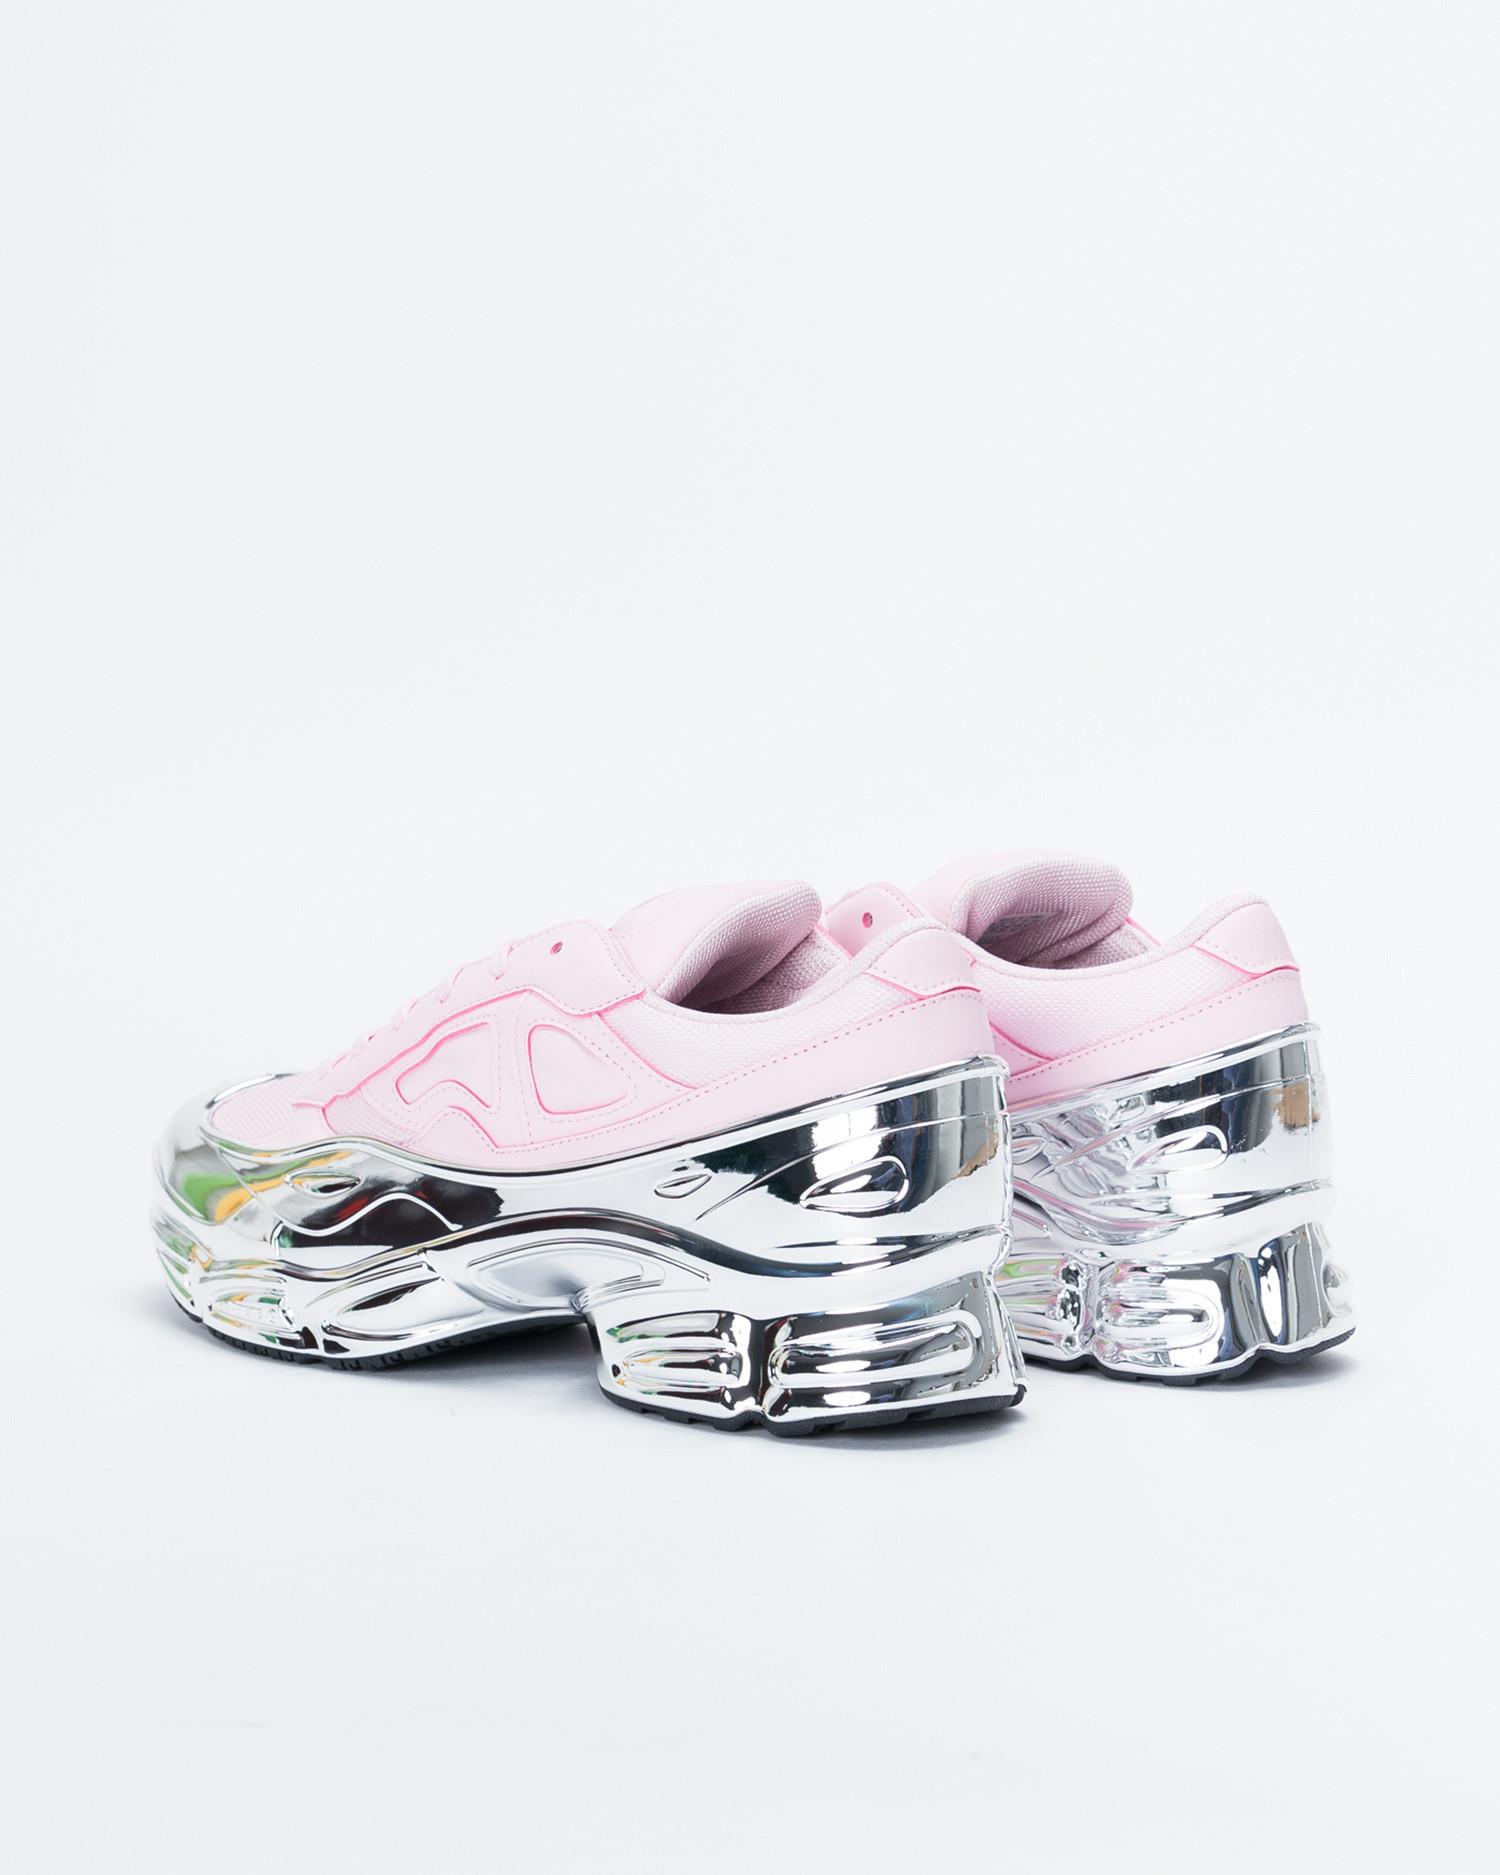 Adidas Raf Simons Ozweego Cpink/Silvmt/Silvmt